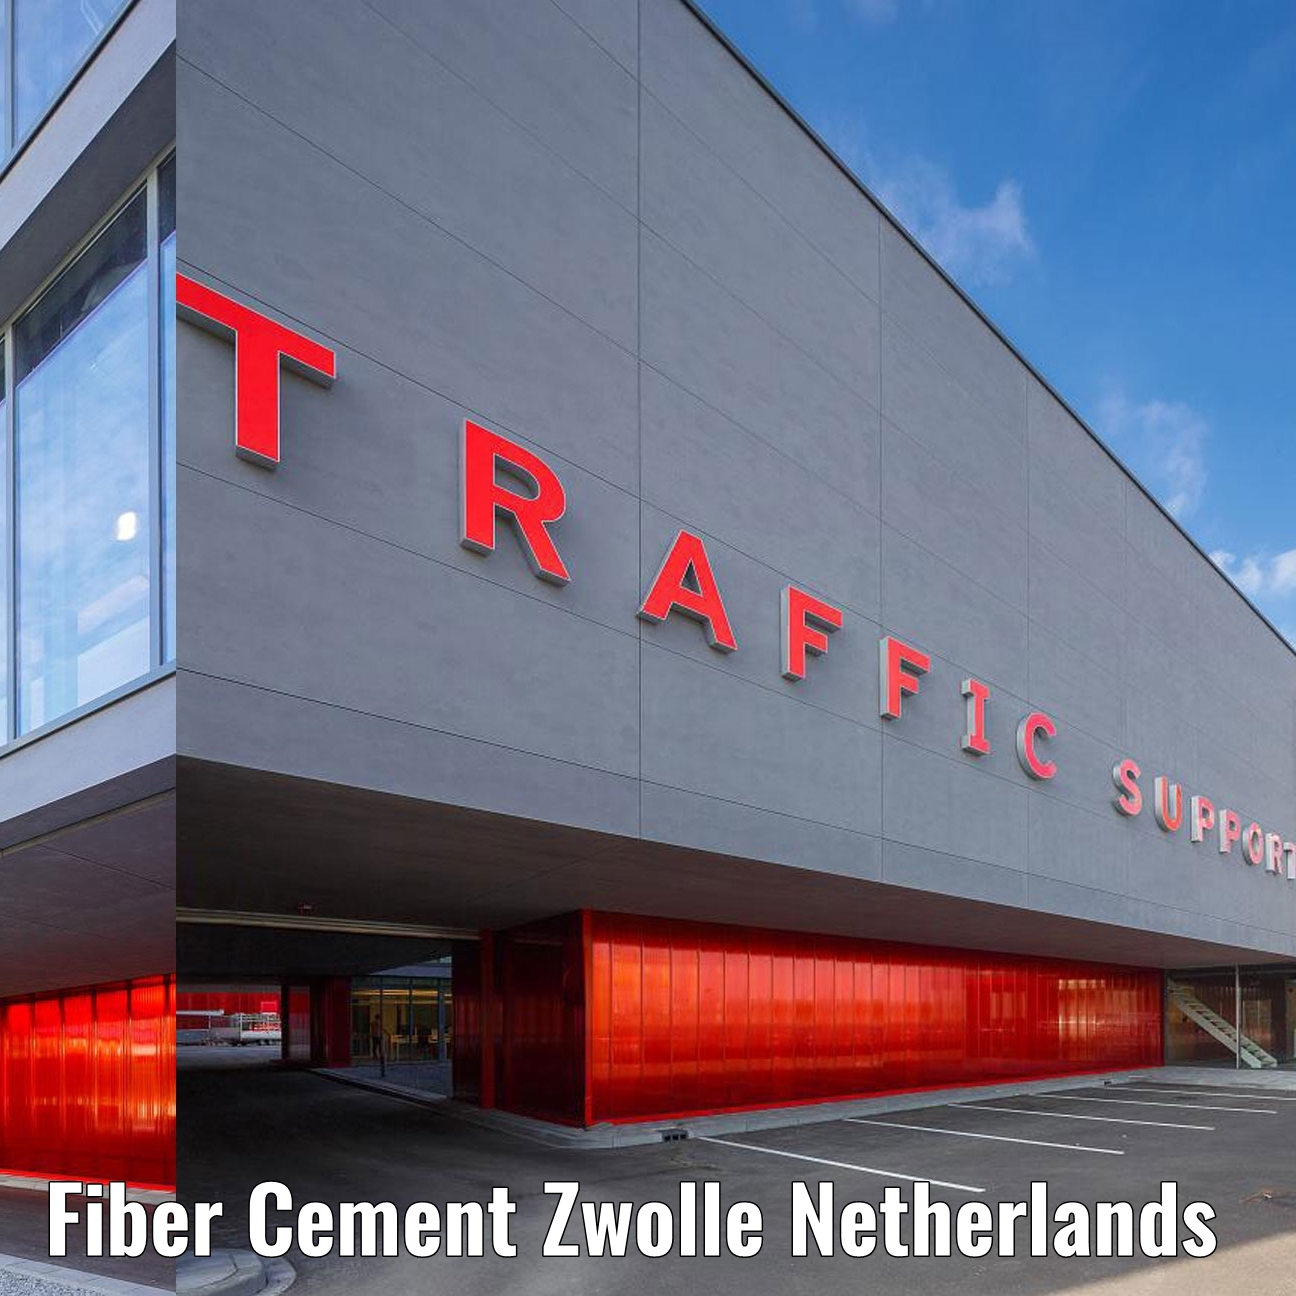 Fiber Cement Board Zwolle the Netherlands 1aa